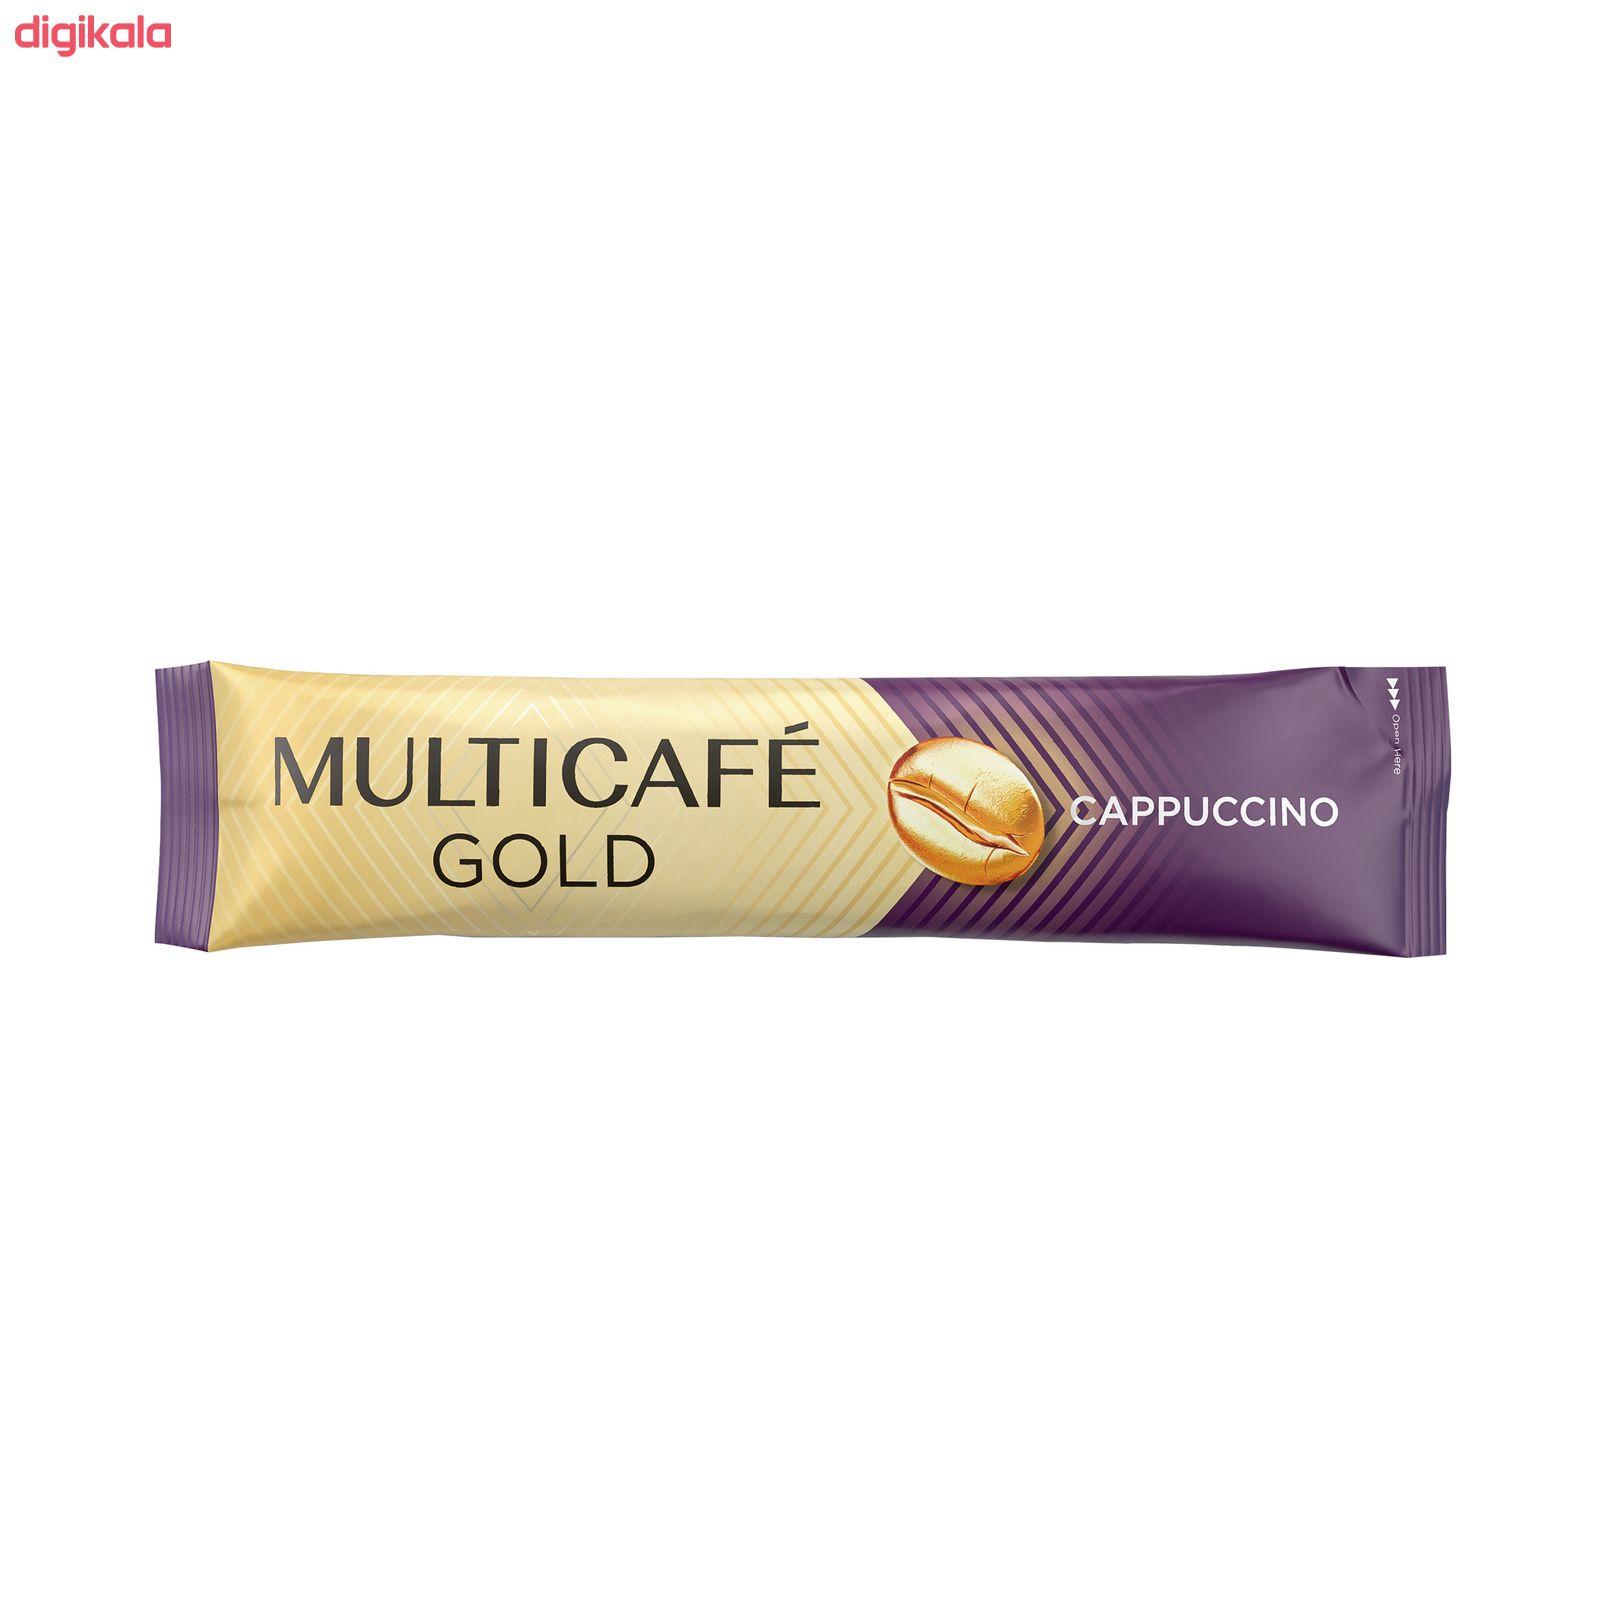 کاپوچینو گلد مولتی کافه بسته 5 عددی  main 1 3